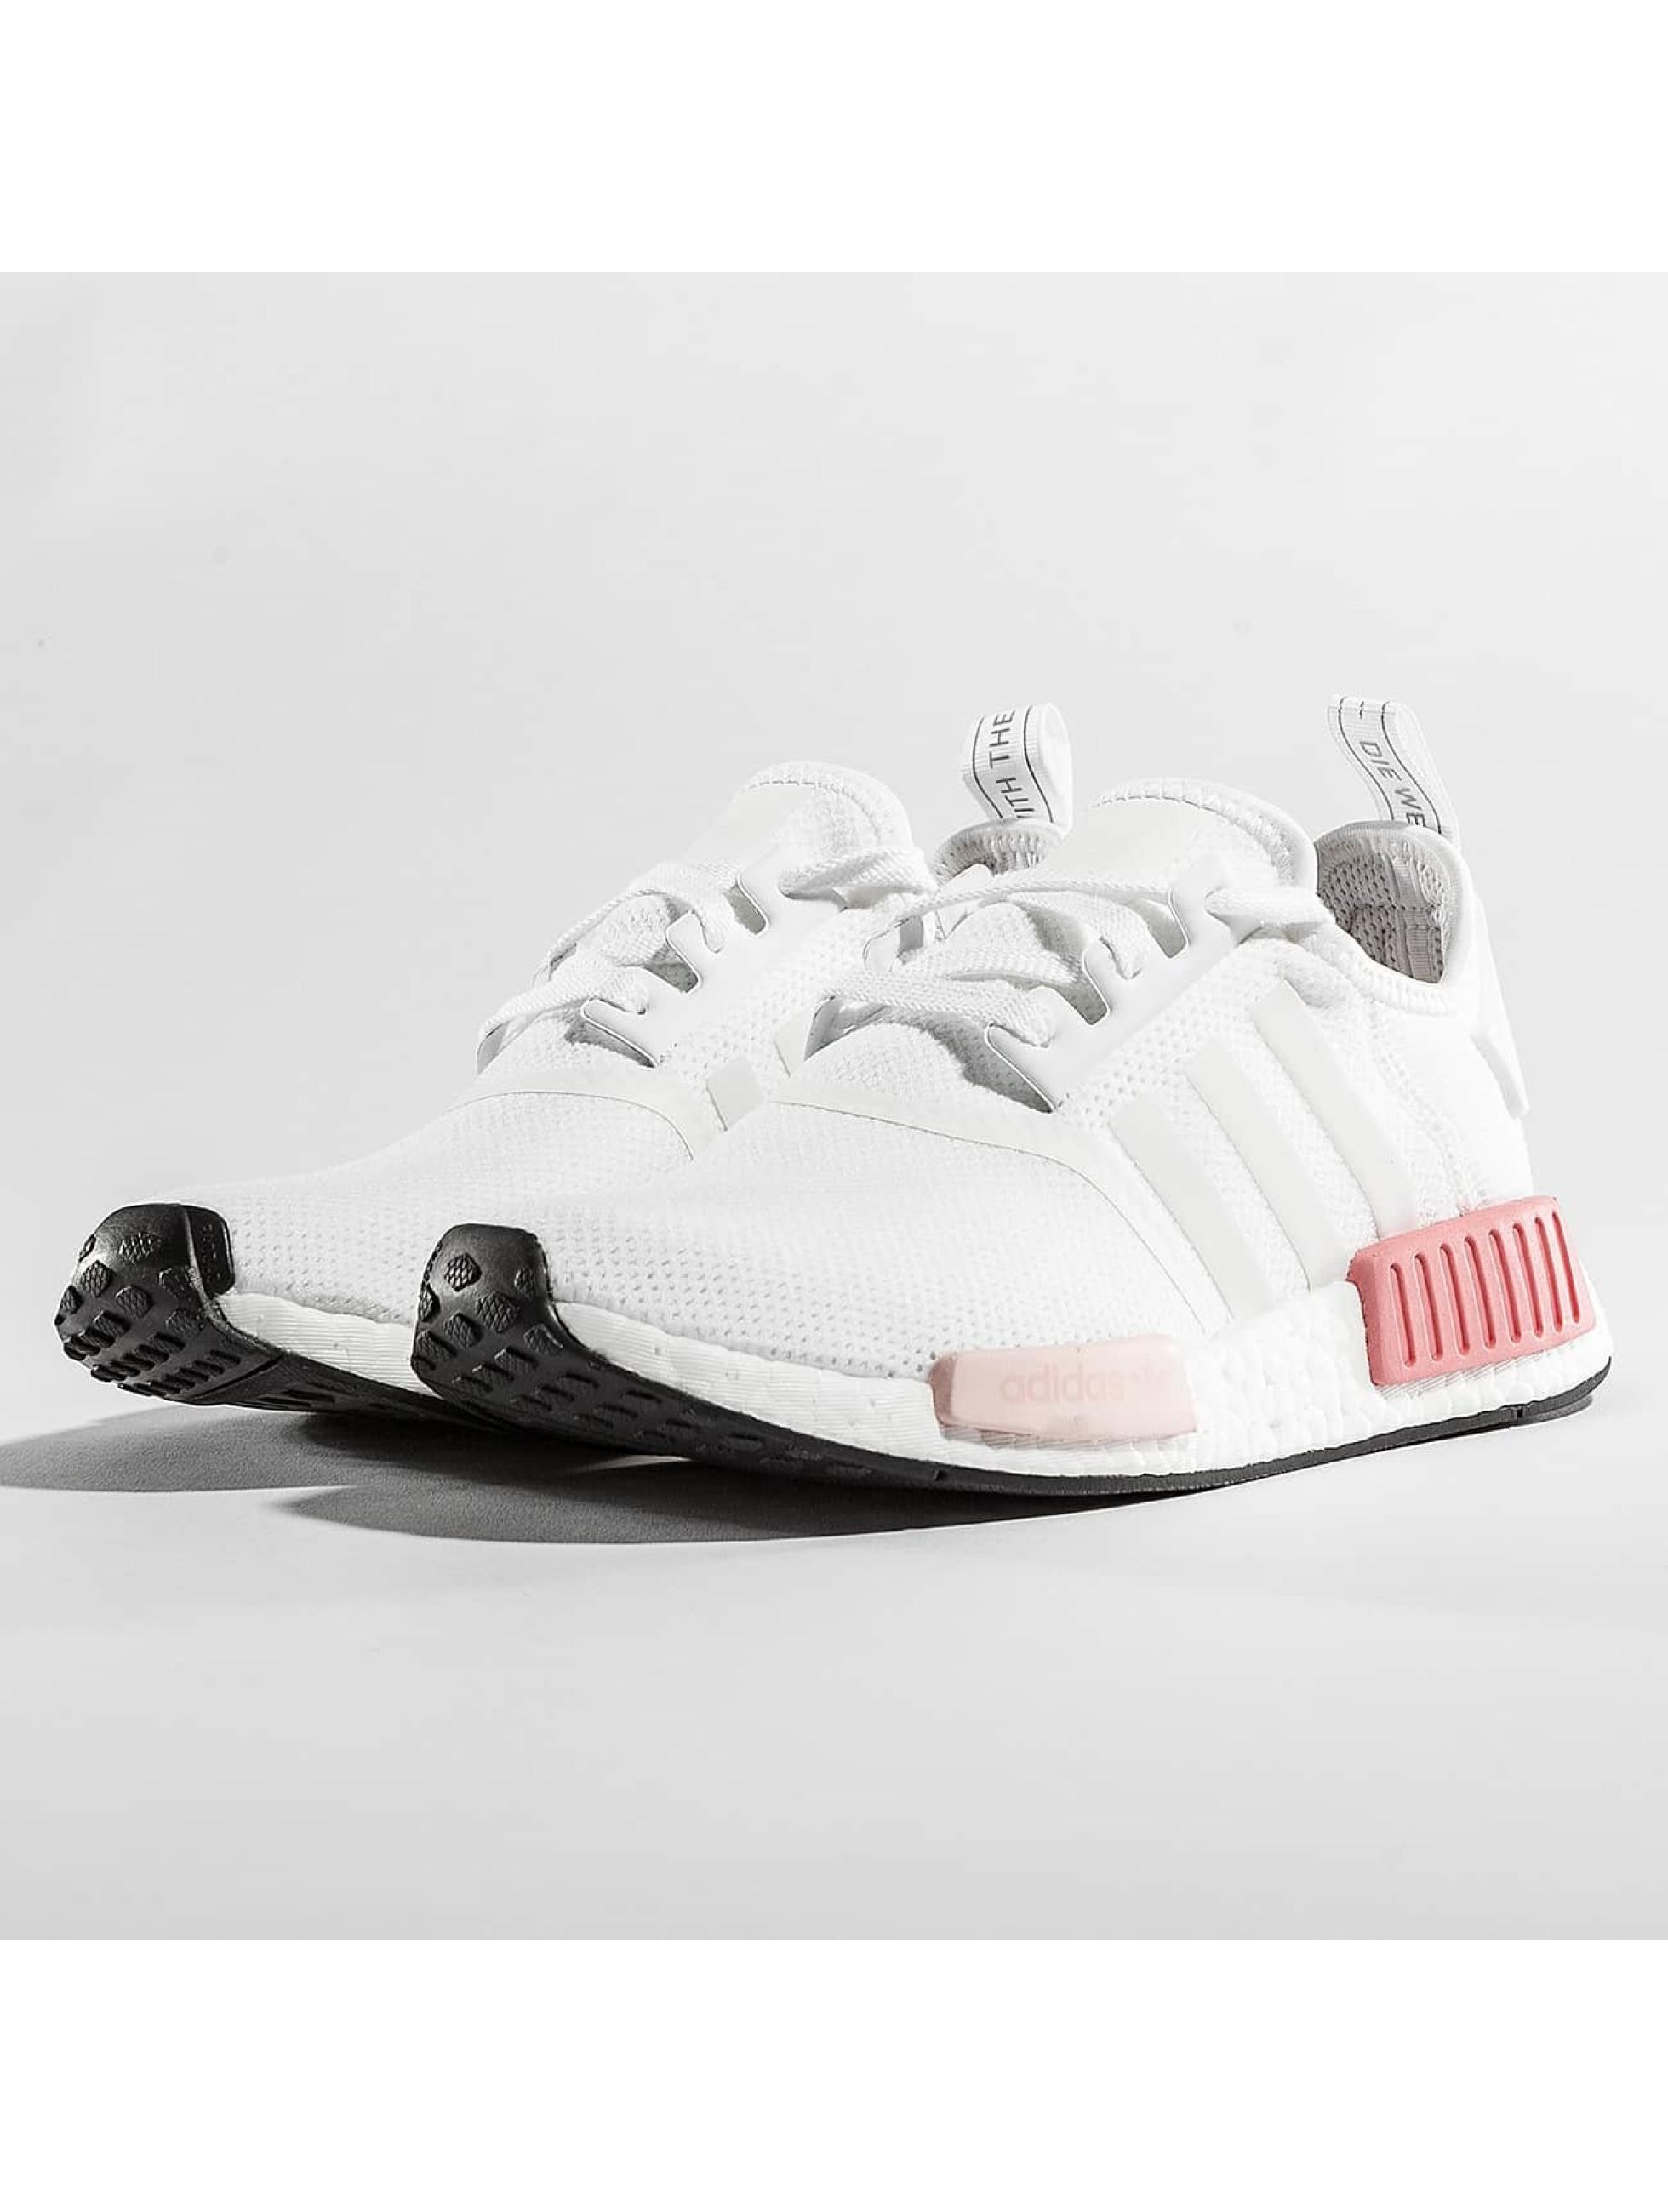 adidas Frauen Sneaker NMD_R1 W in weiß